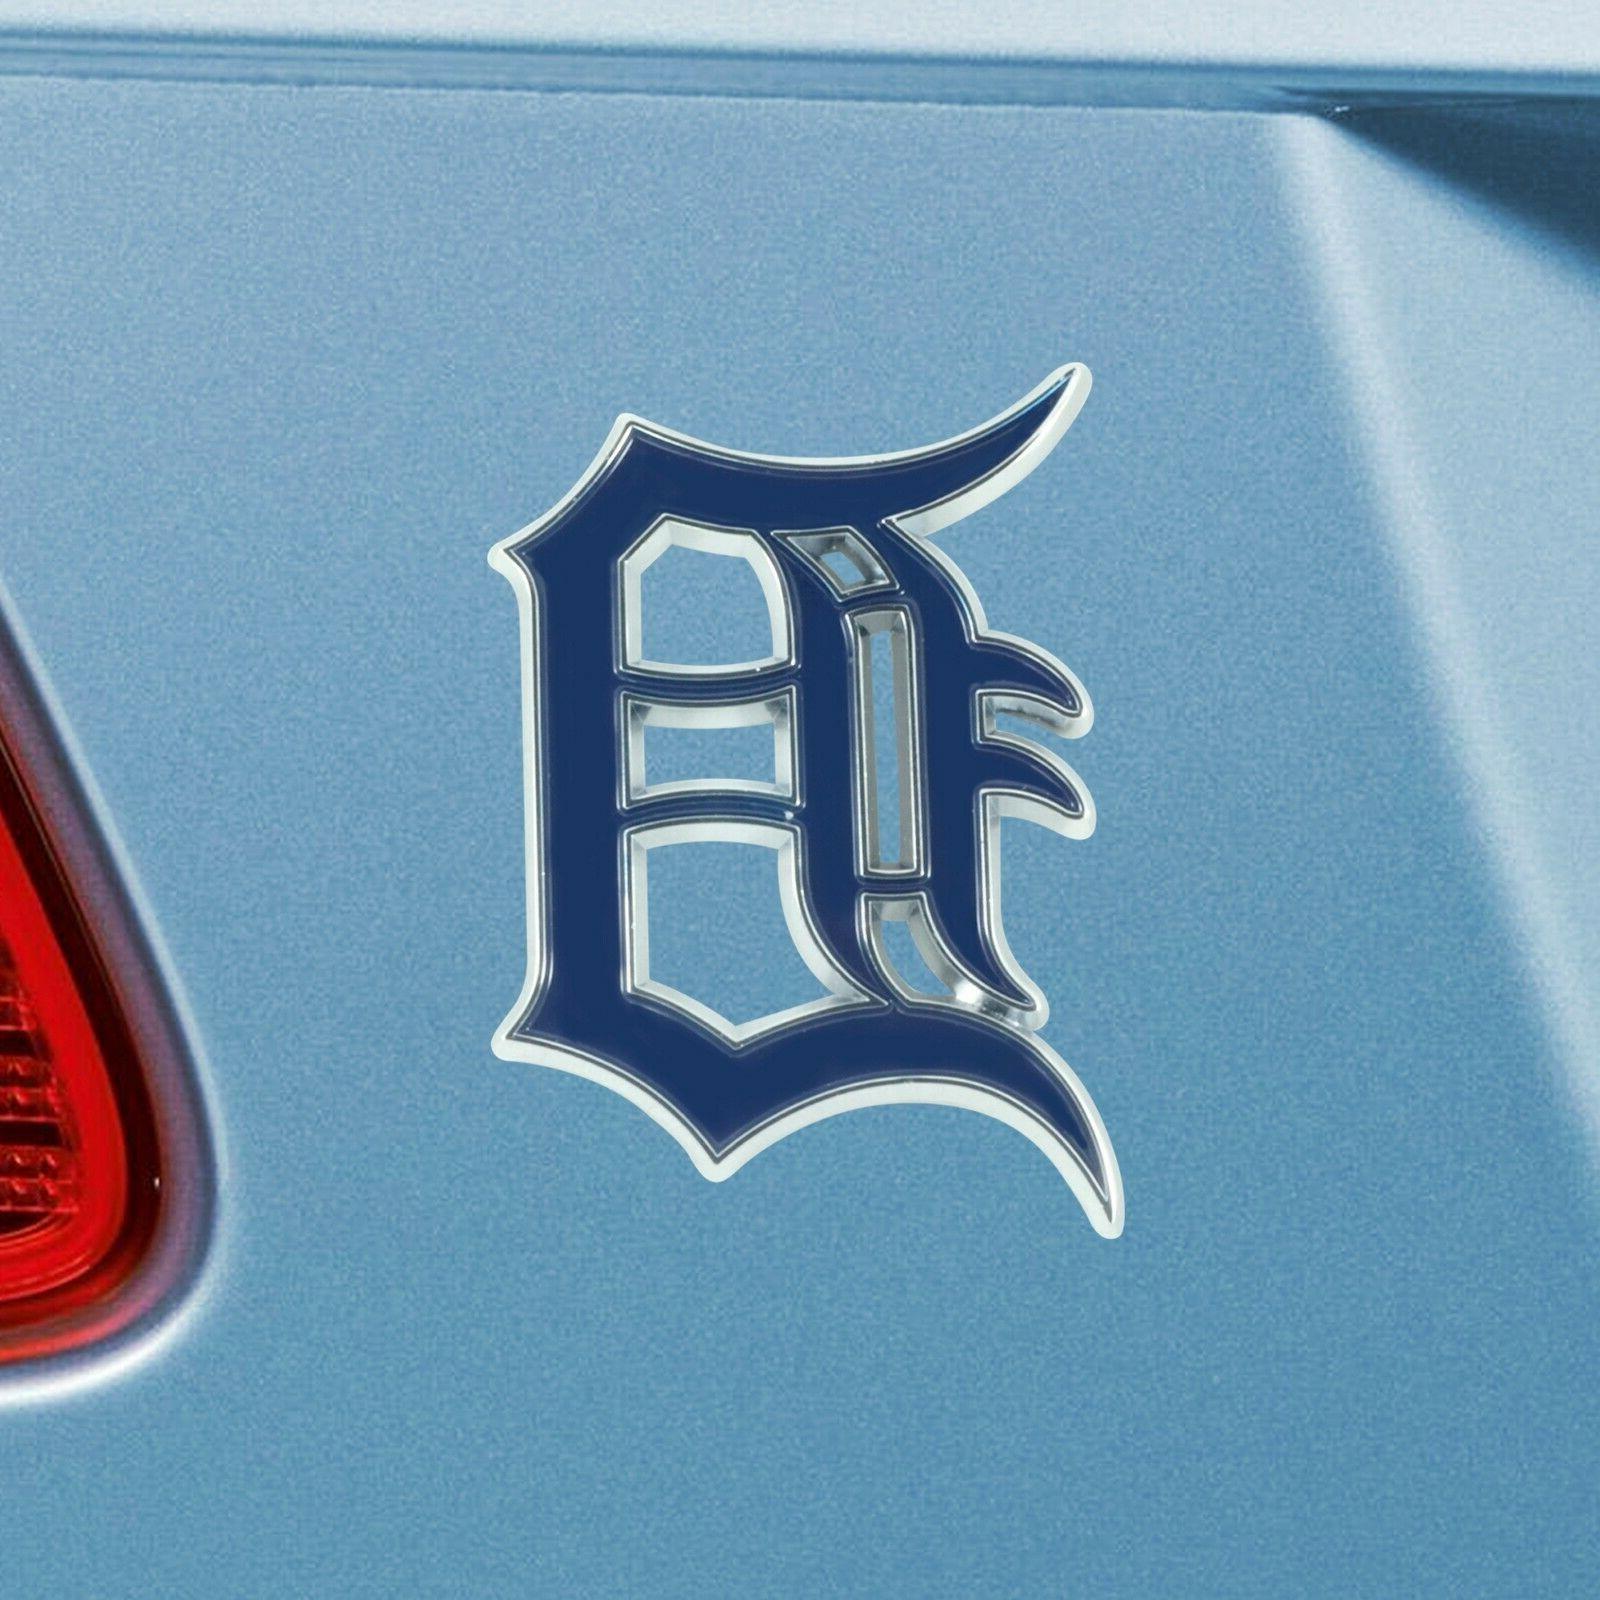 Fanmats MLB Diecast Car Truck RV 2-4 Day